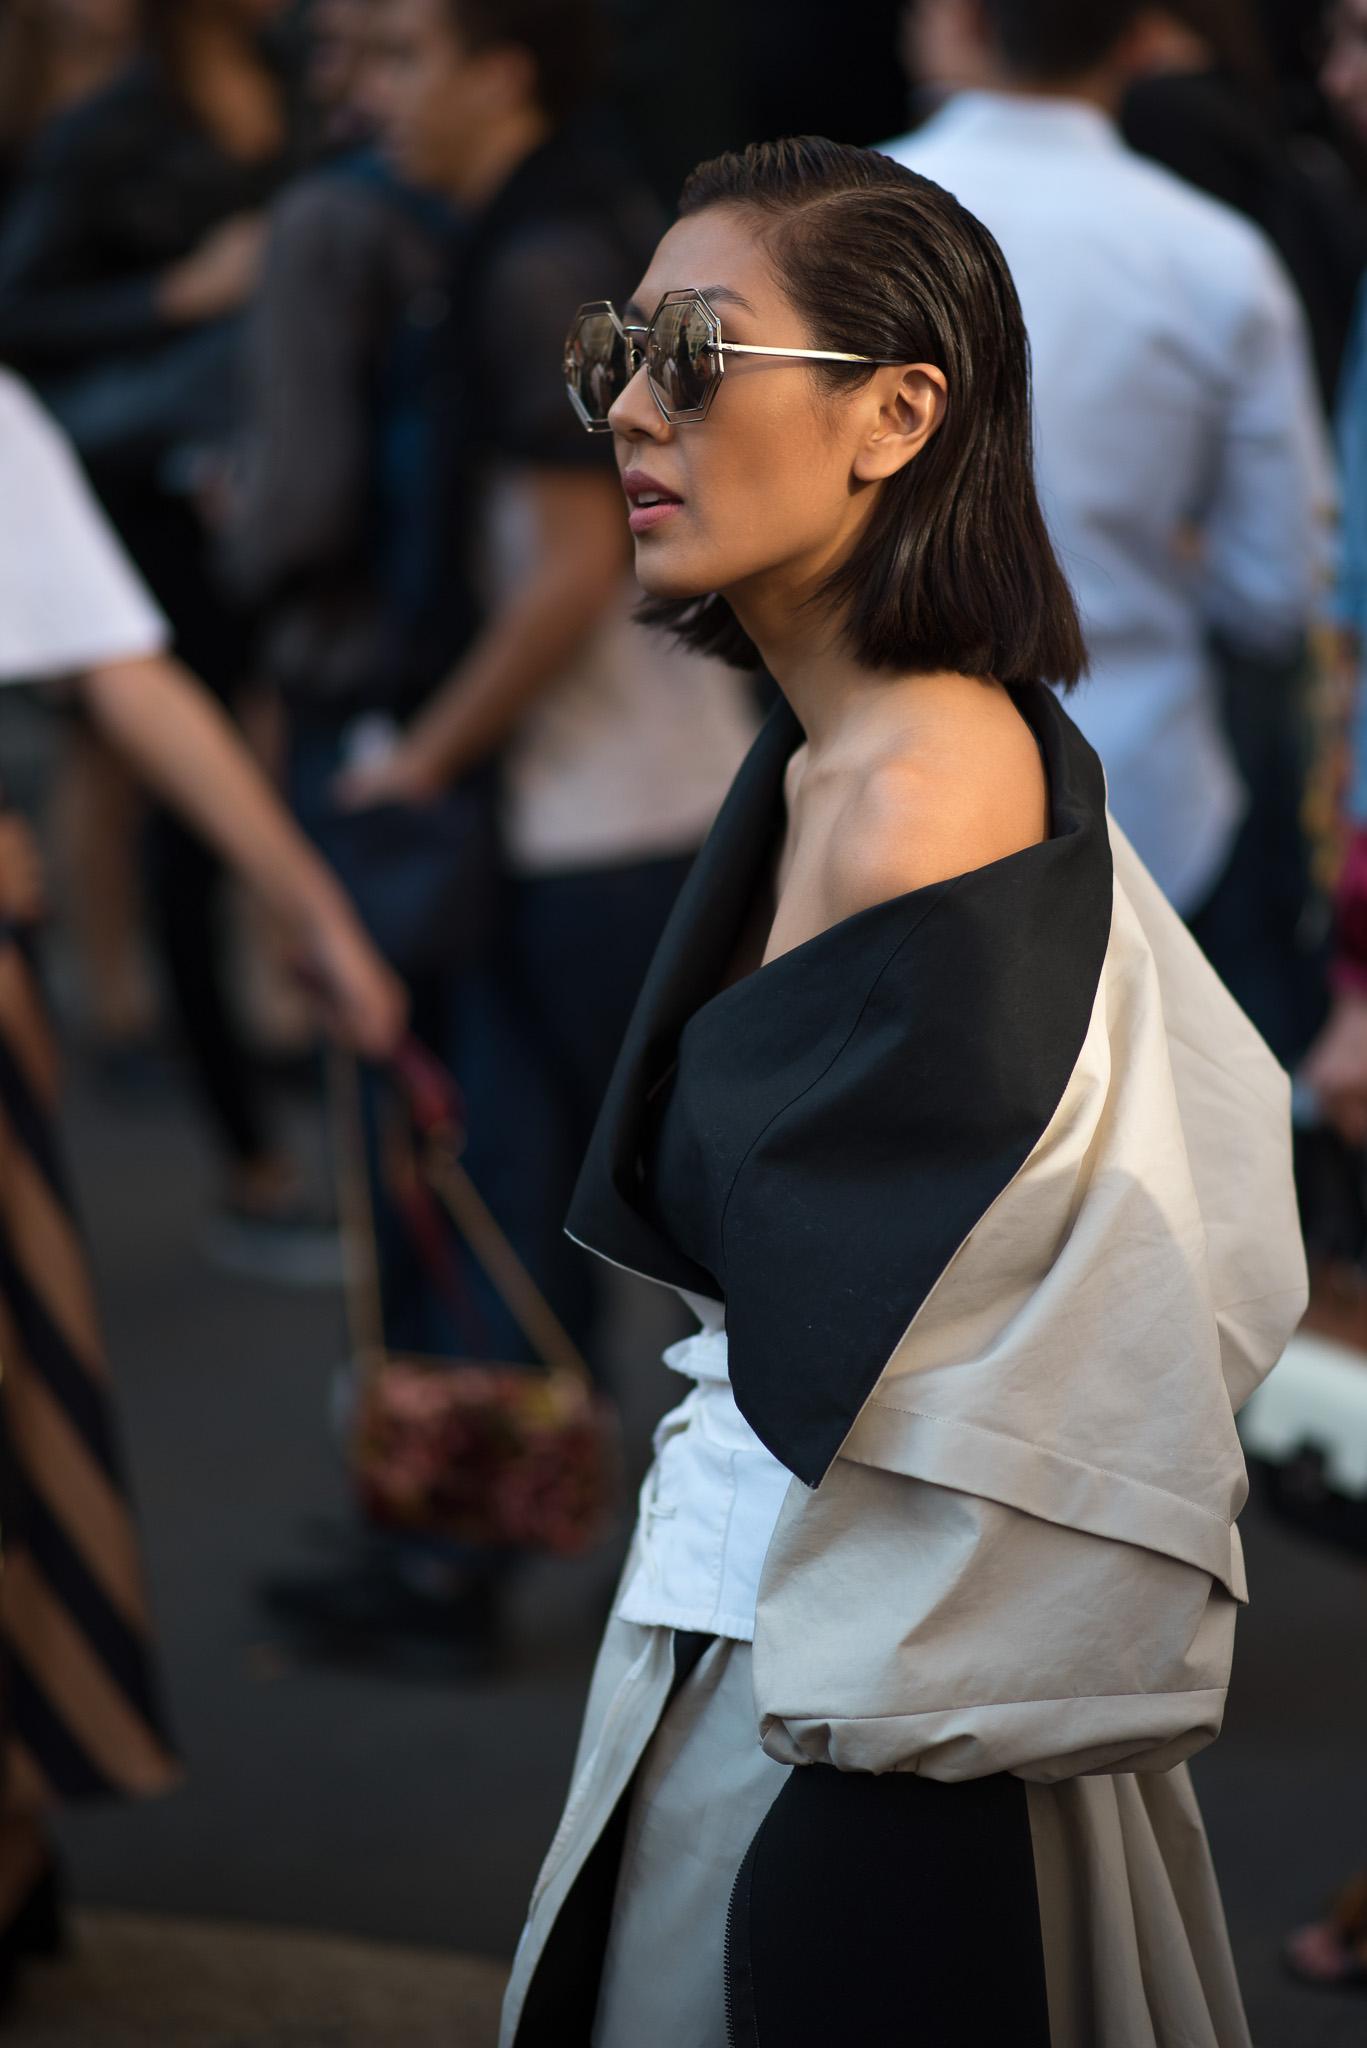 liz-uy_-salvatore-ferragamo_milan-fashion-week_sept-2016_photography-annika-lagerqvist_www-annikasomething-com-2